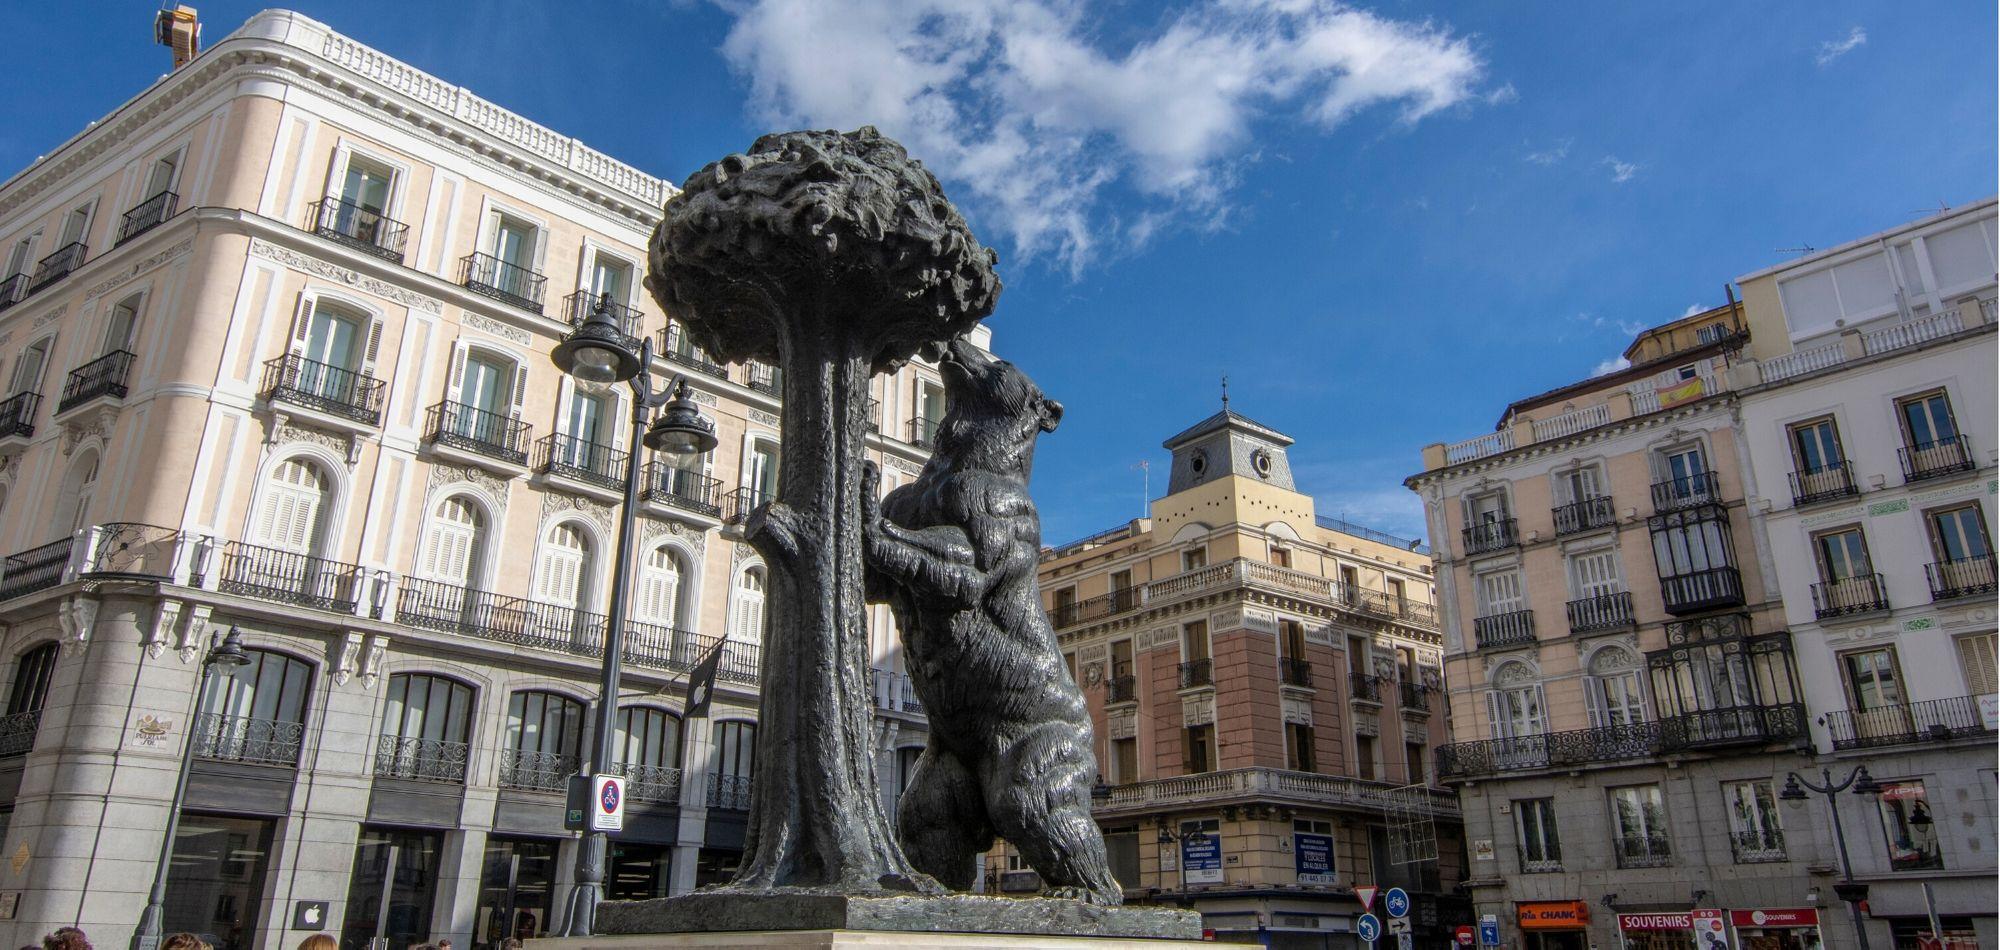 Puerta del Sol. Centrum słonecznej Hiszpanii